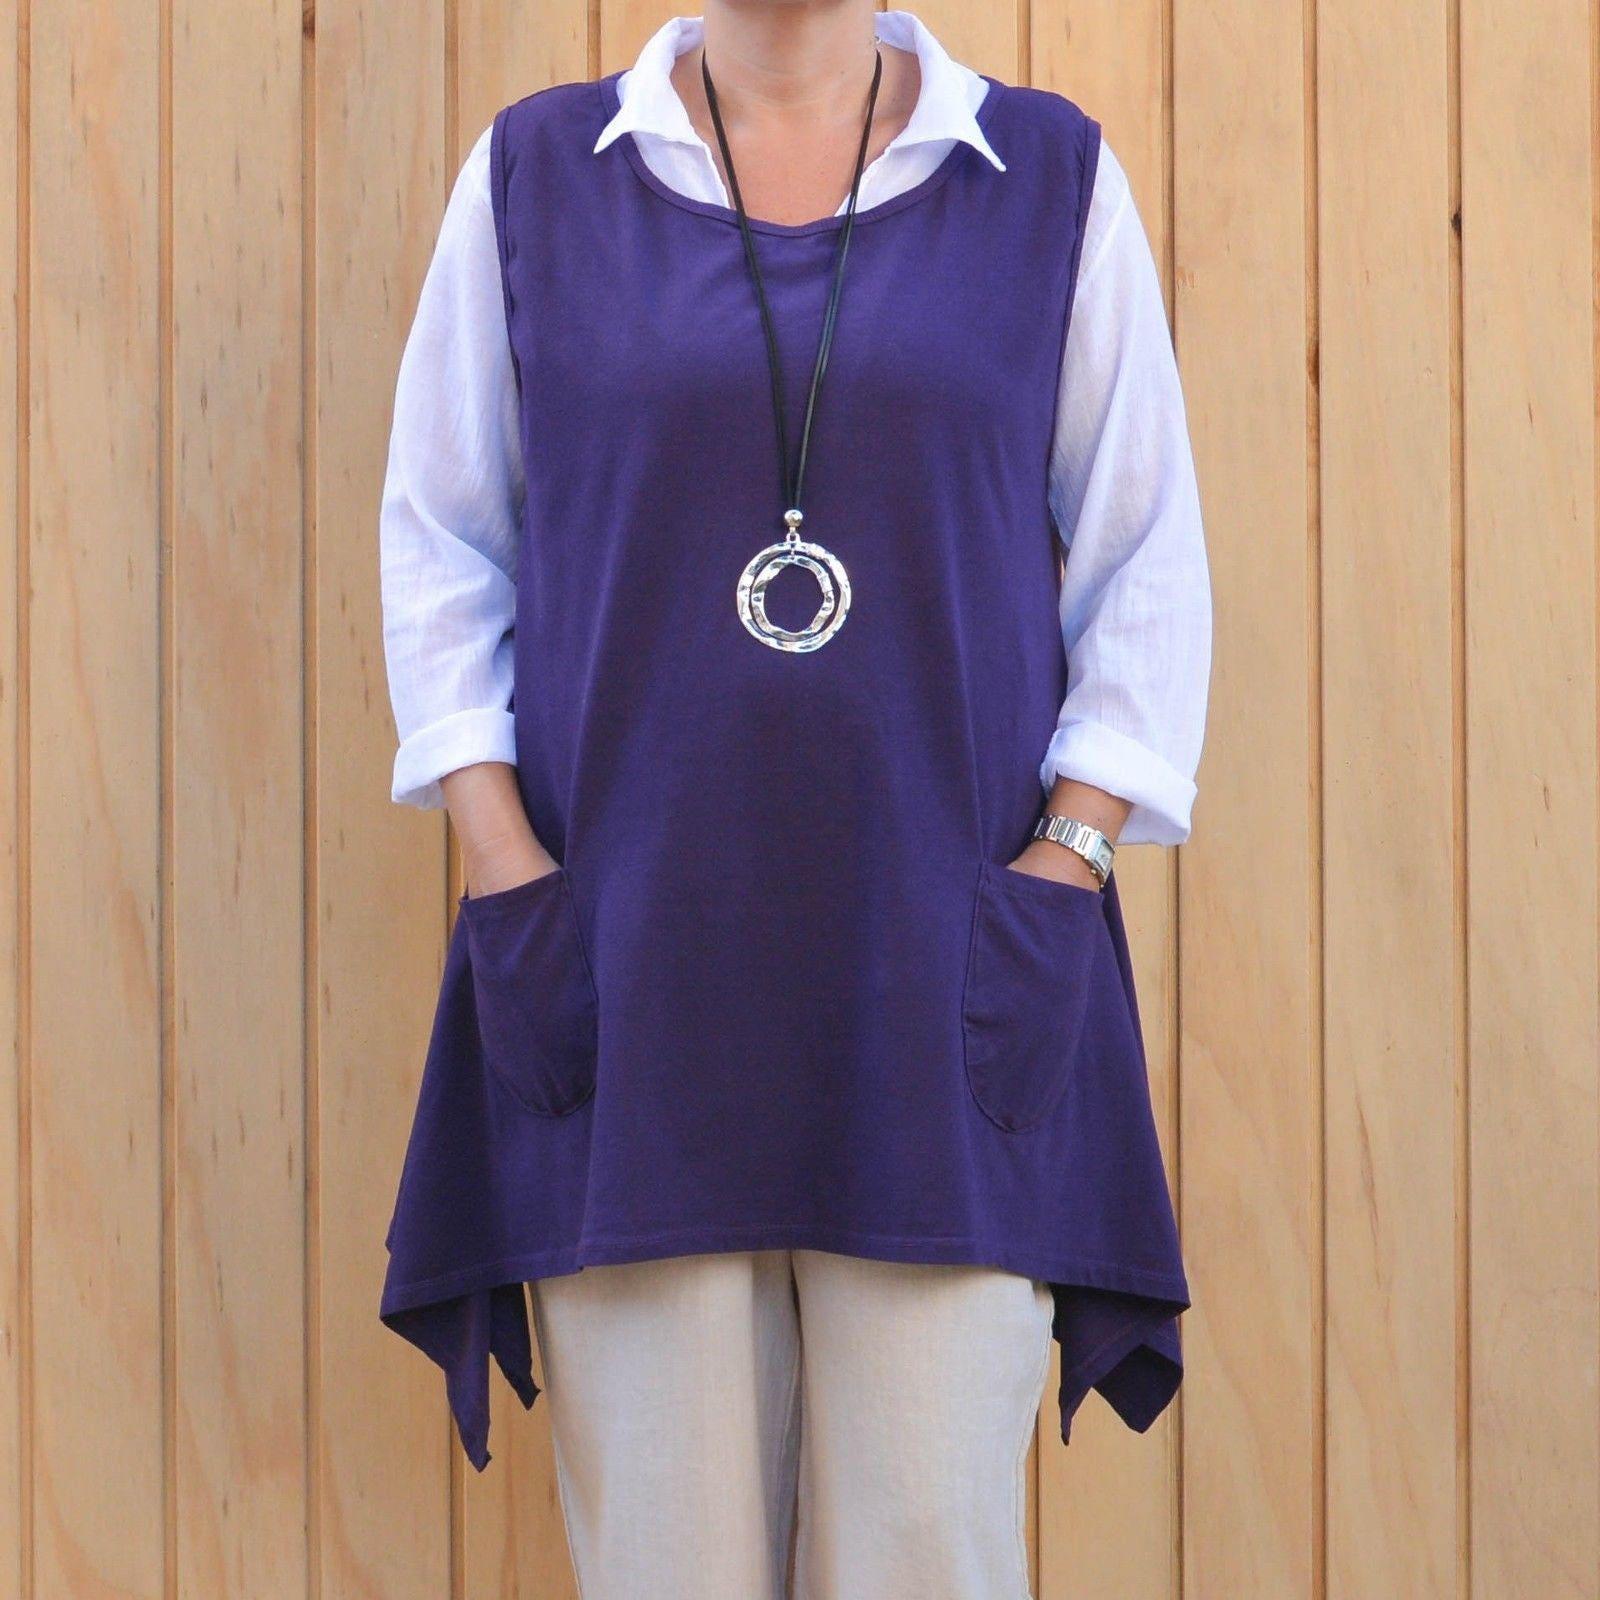 91889971df3 Lagenlook Cotton Jersey Sleeveless Tunic Vest Purple Plus Size 16-20.  gallery photo ...